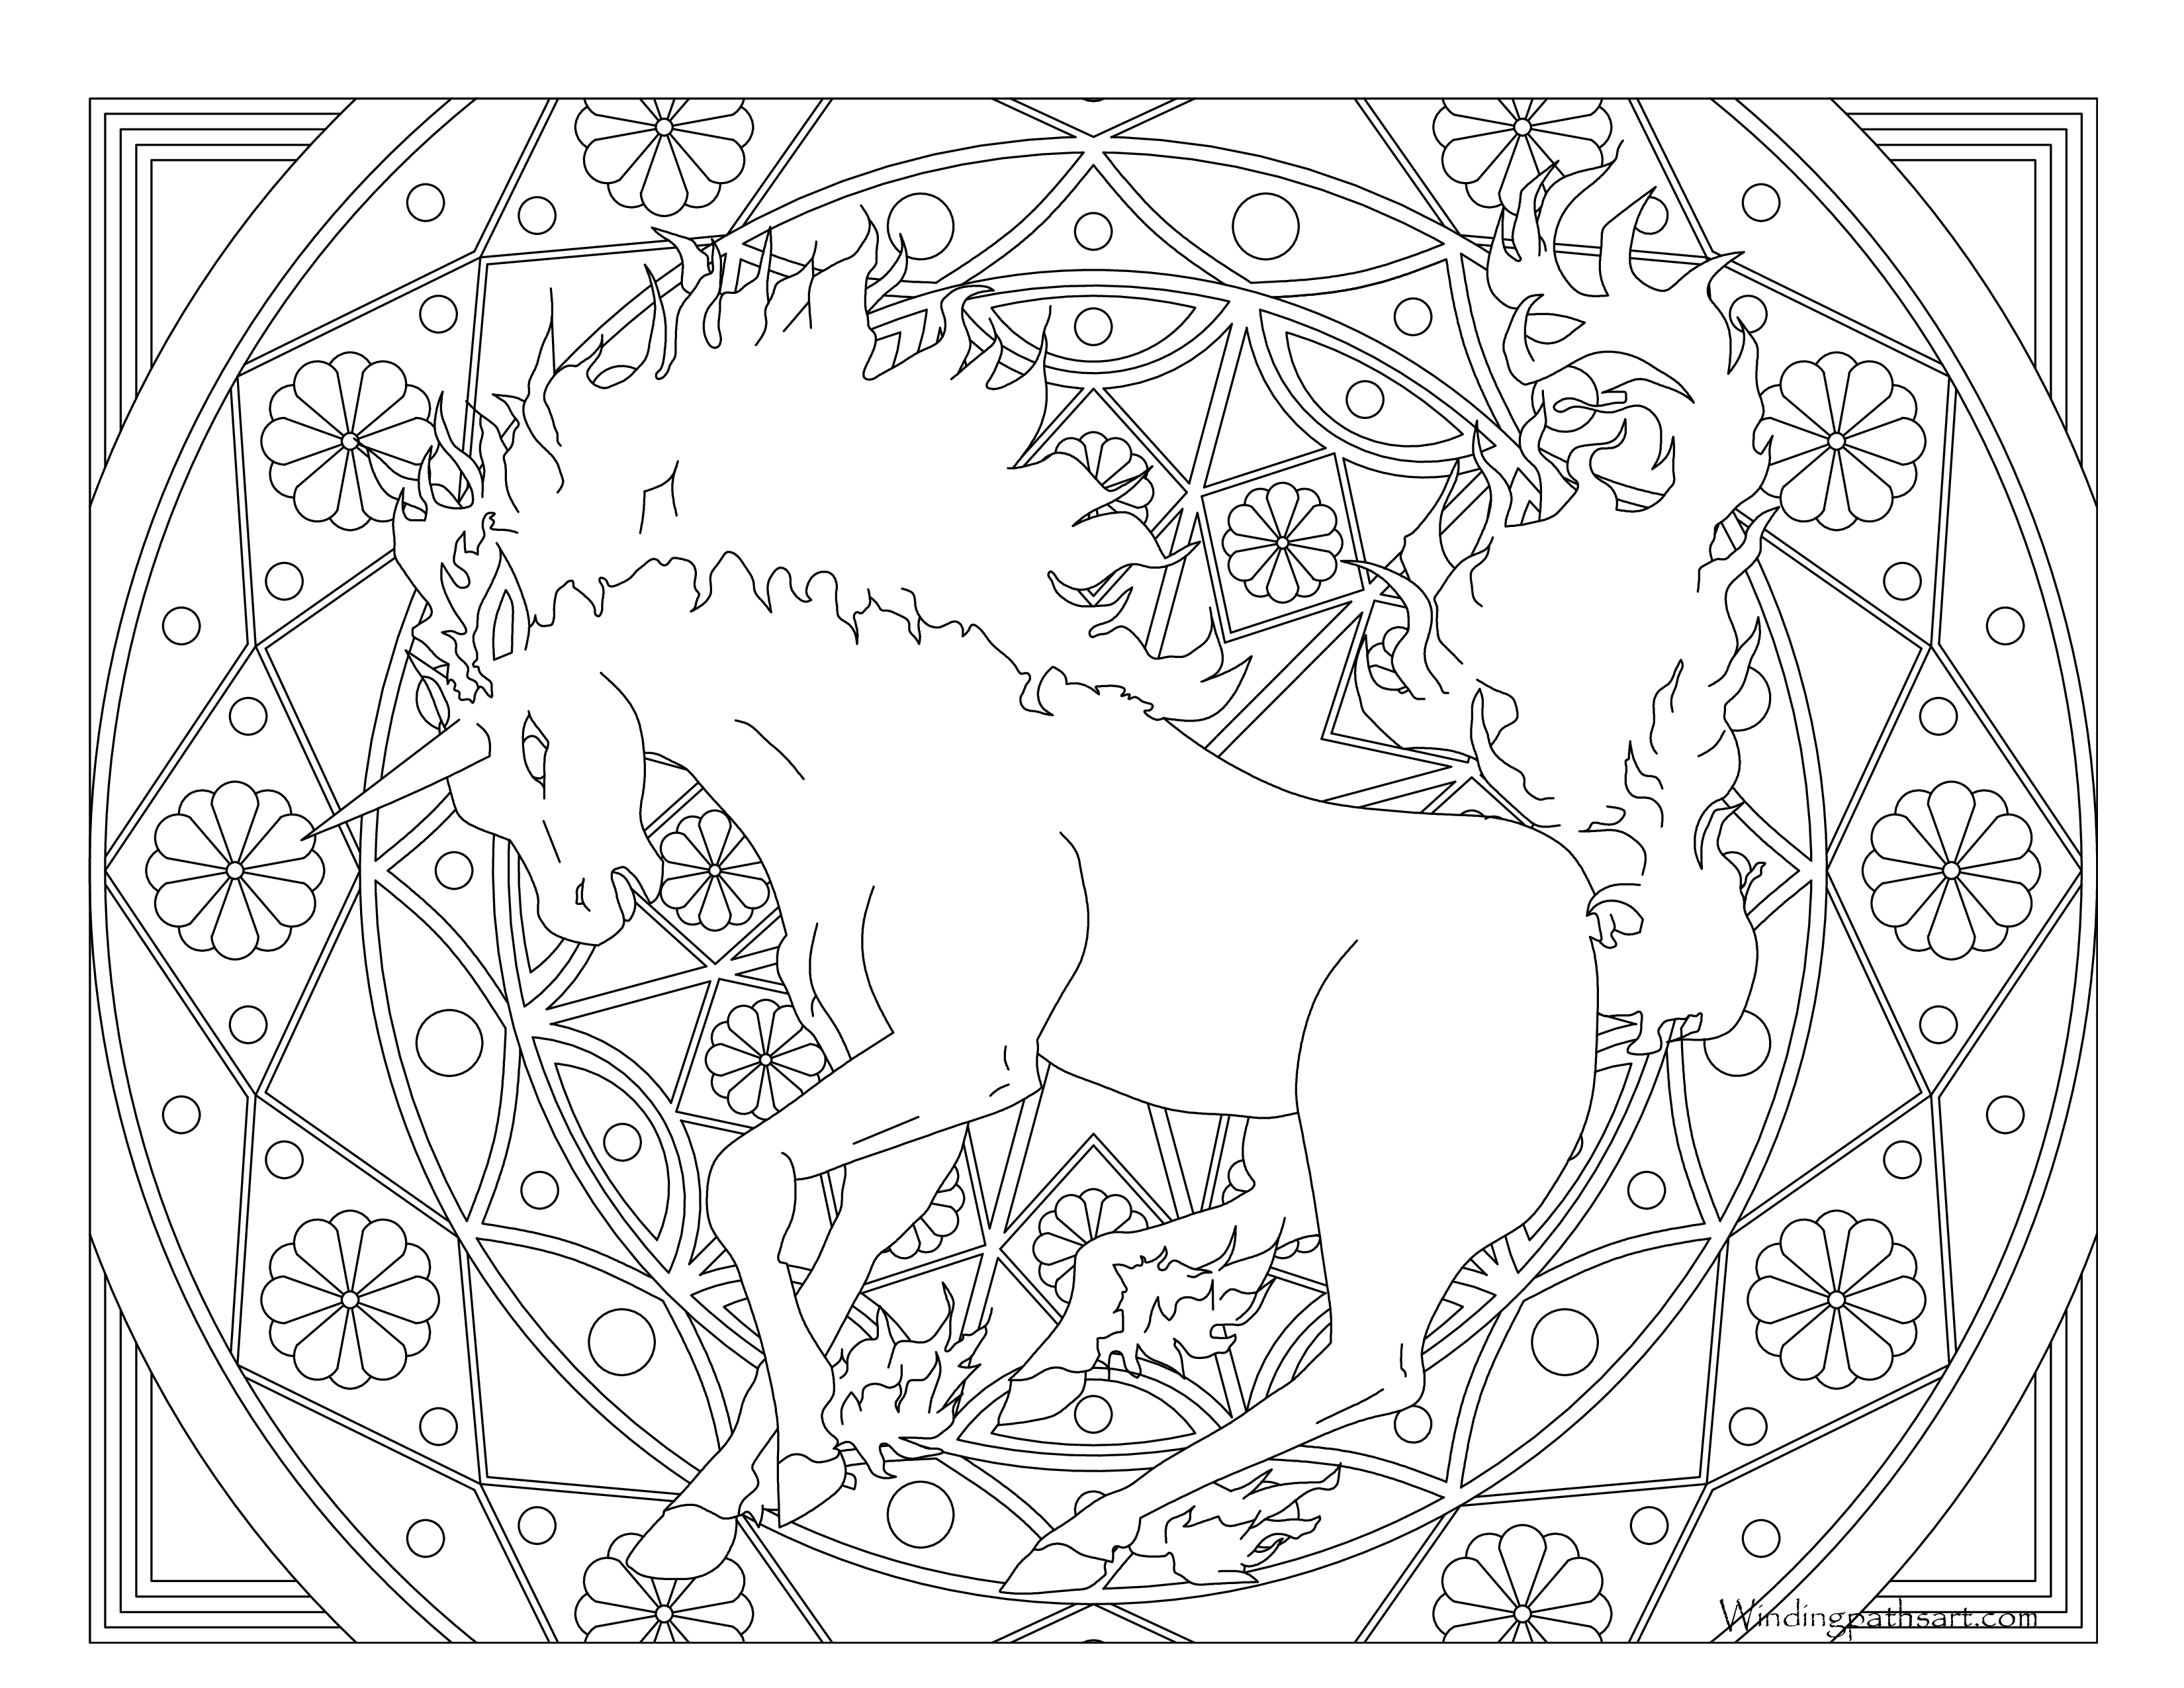 Rapidash Coloring Page